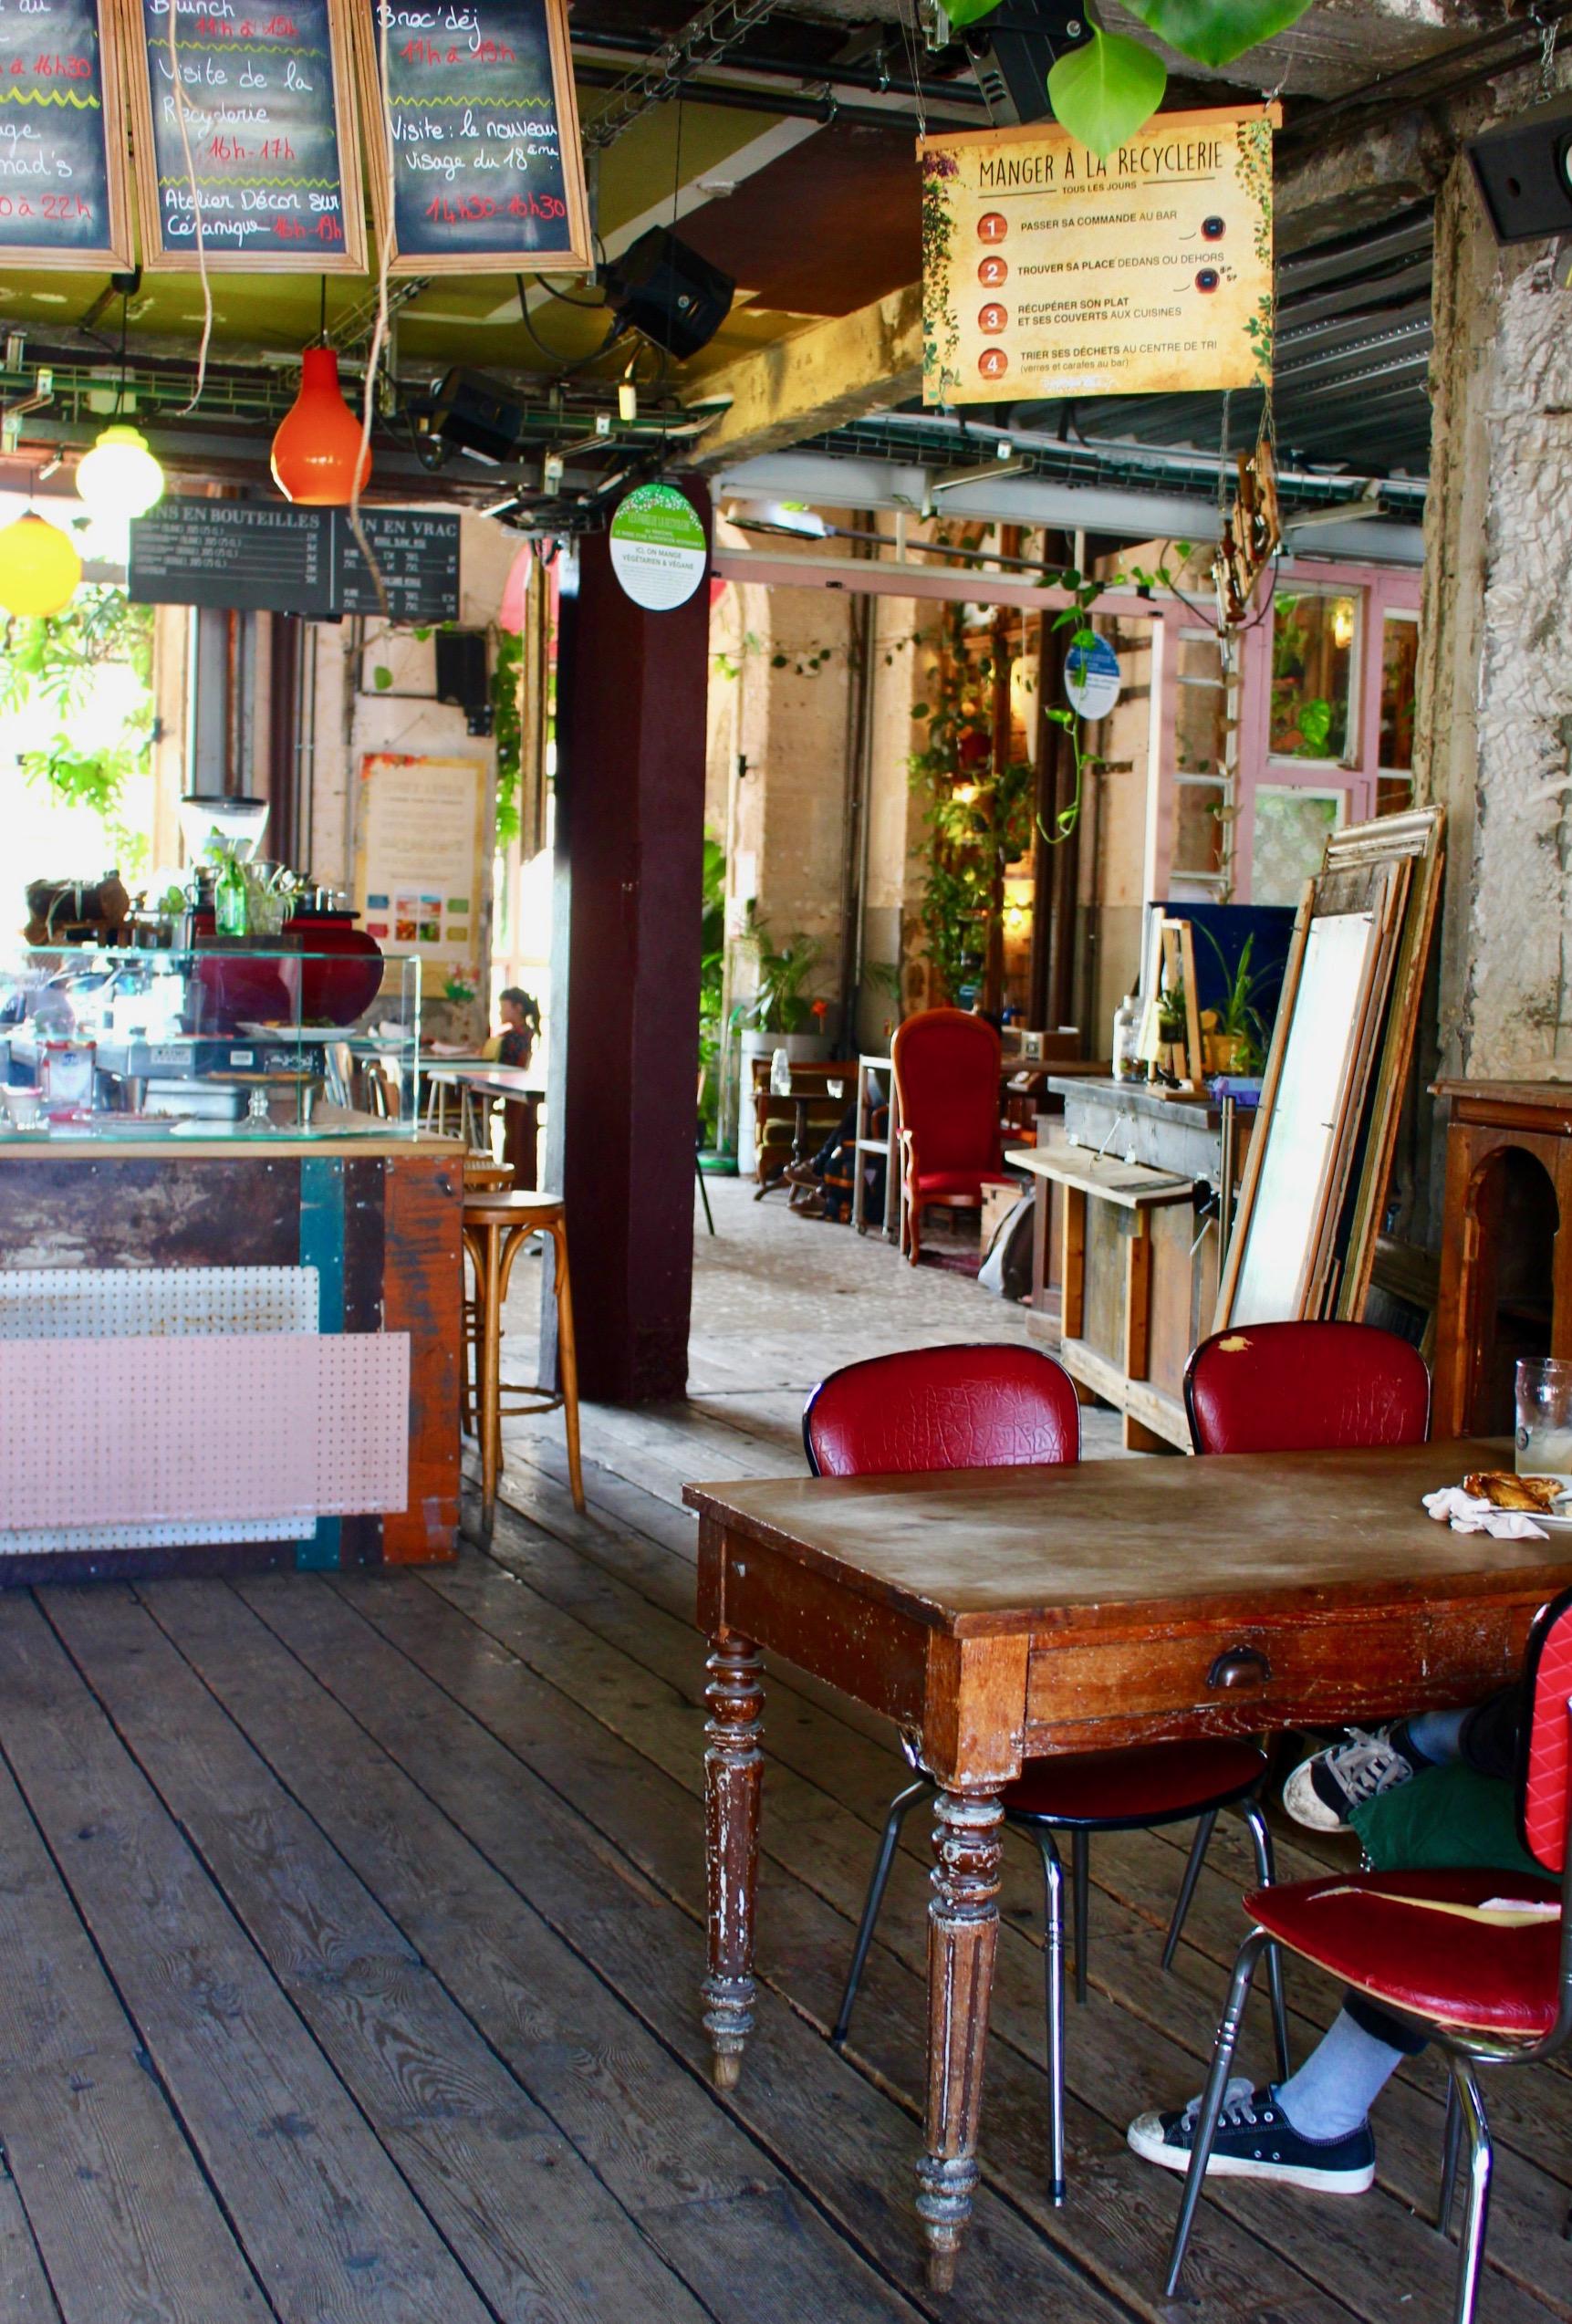 restaurant-bar-bio-vegetarien-vegan-paris.jpg